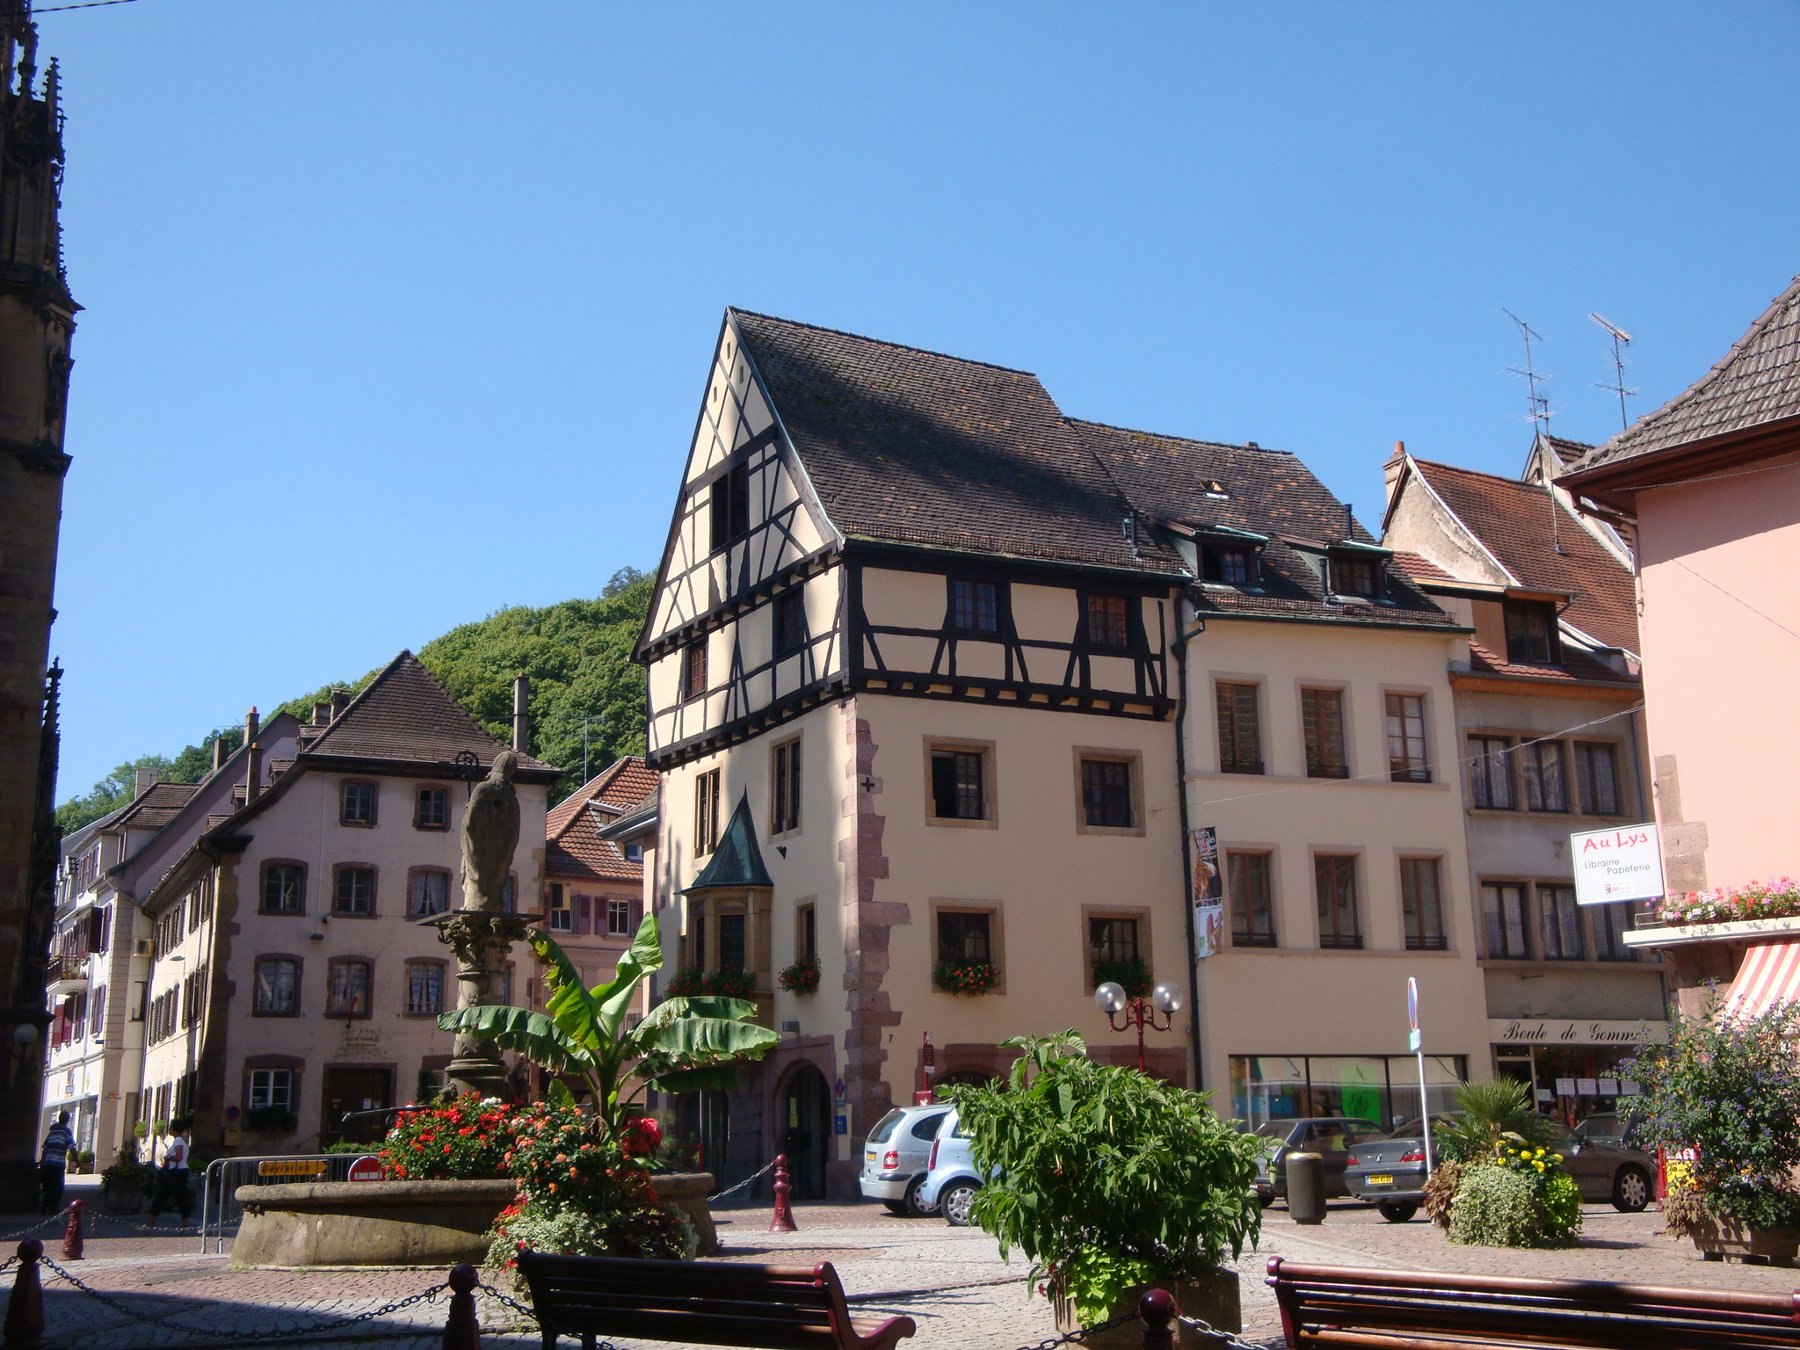 Office de tourisme de thann cernay bureau de thann thann - Office de tourisme de cernay ...